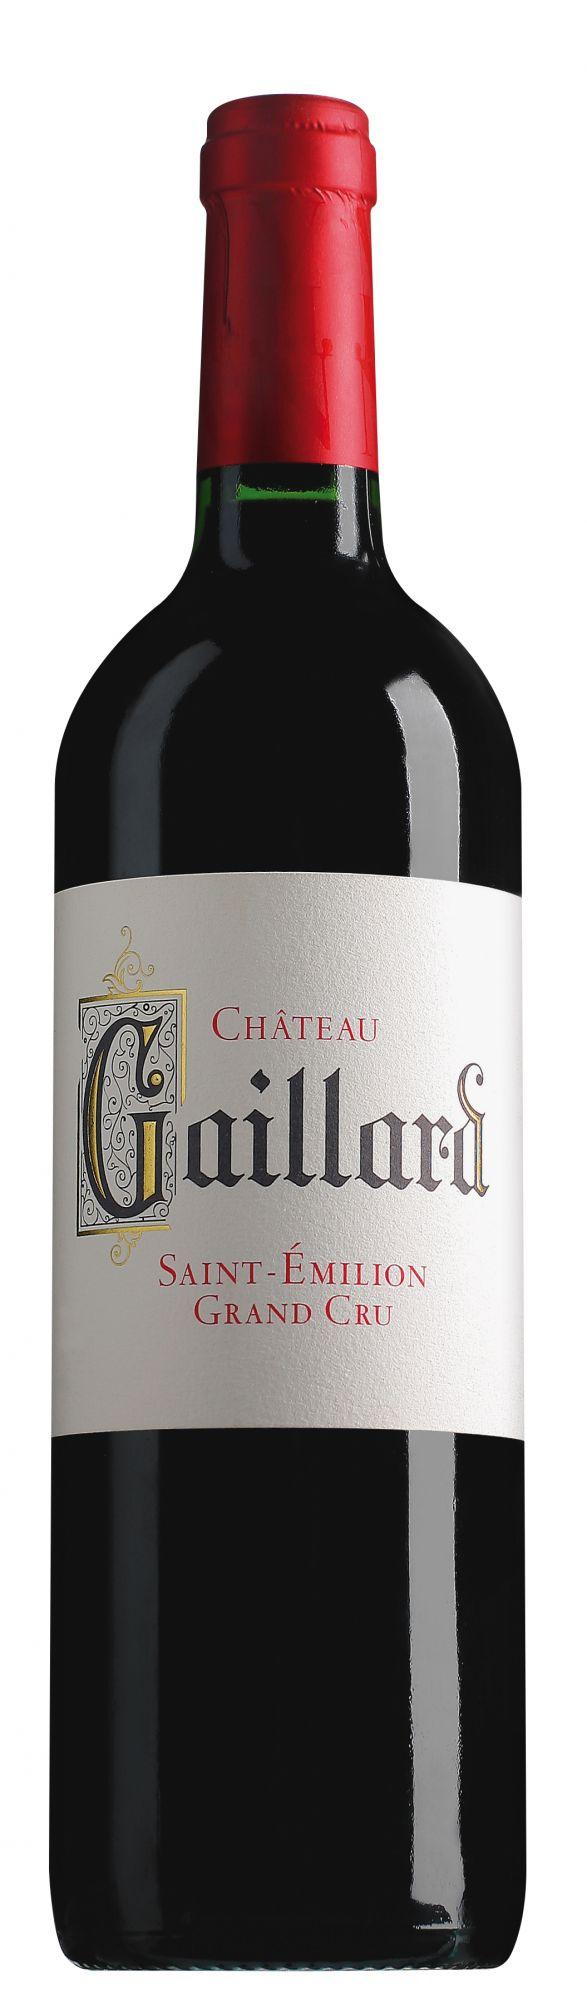 Château Gaillard Saint-Émilion Grand Cru